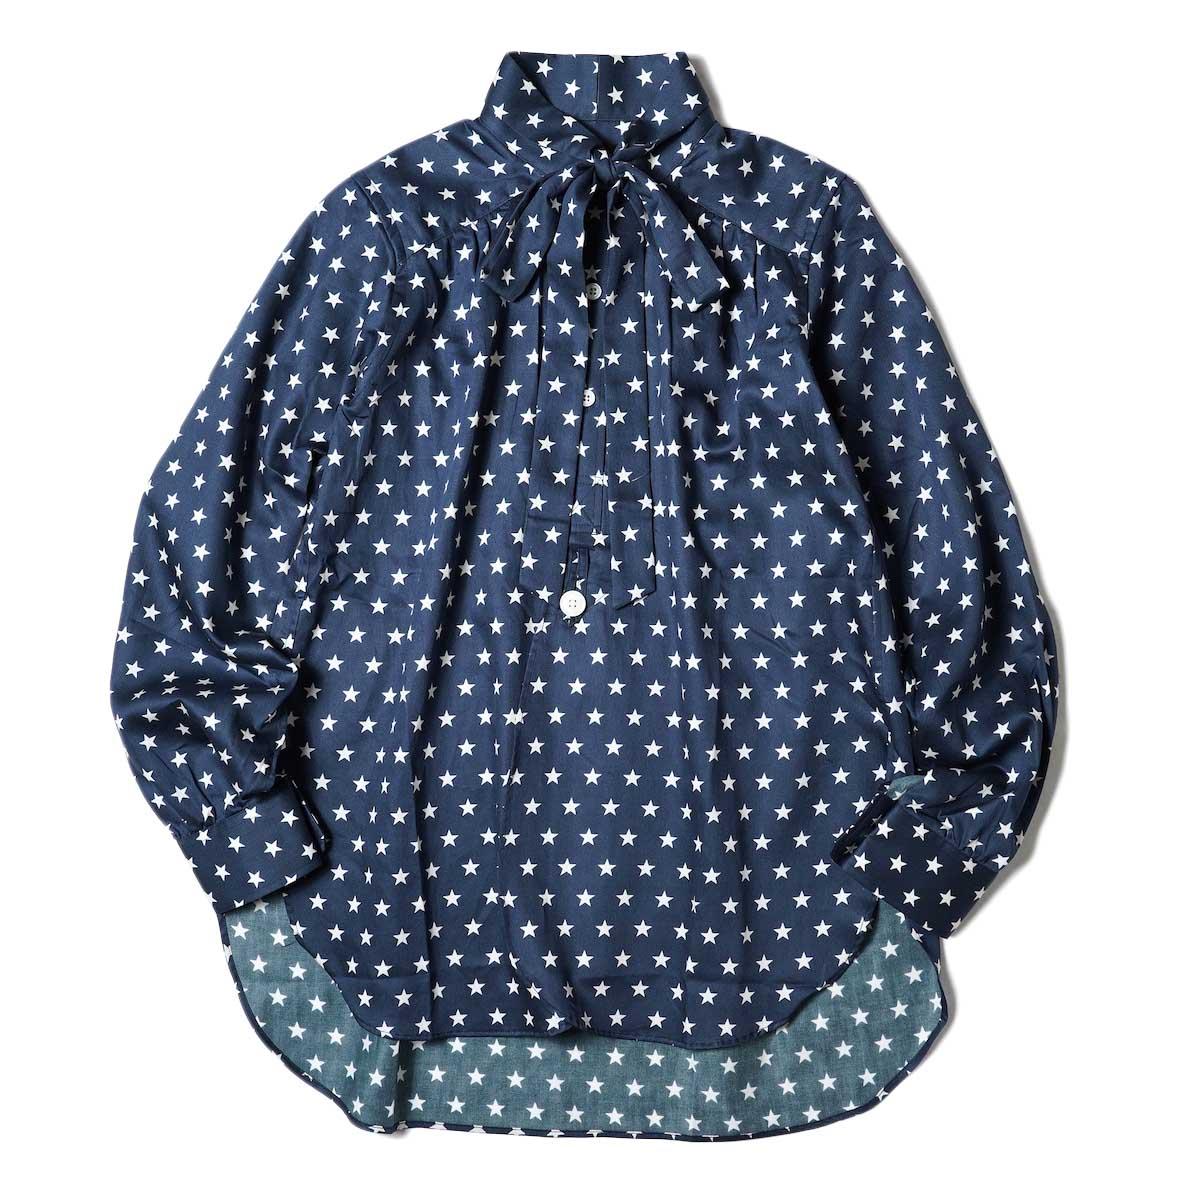 Needles / Ascot Collar EDW Shirt - Cotton Sateen / Pt (Star B) 正面